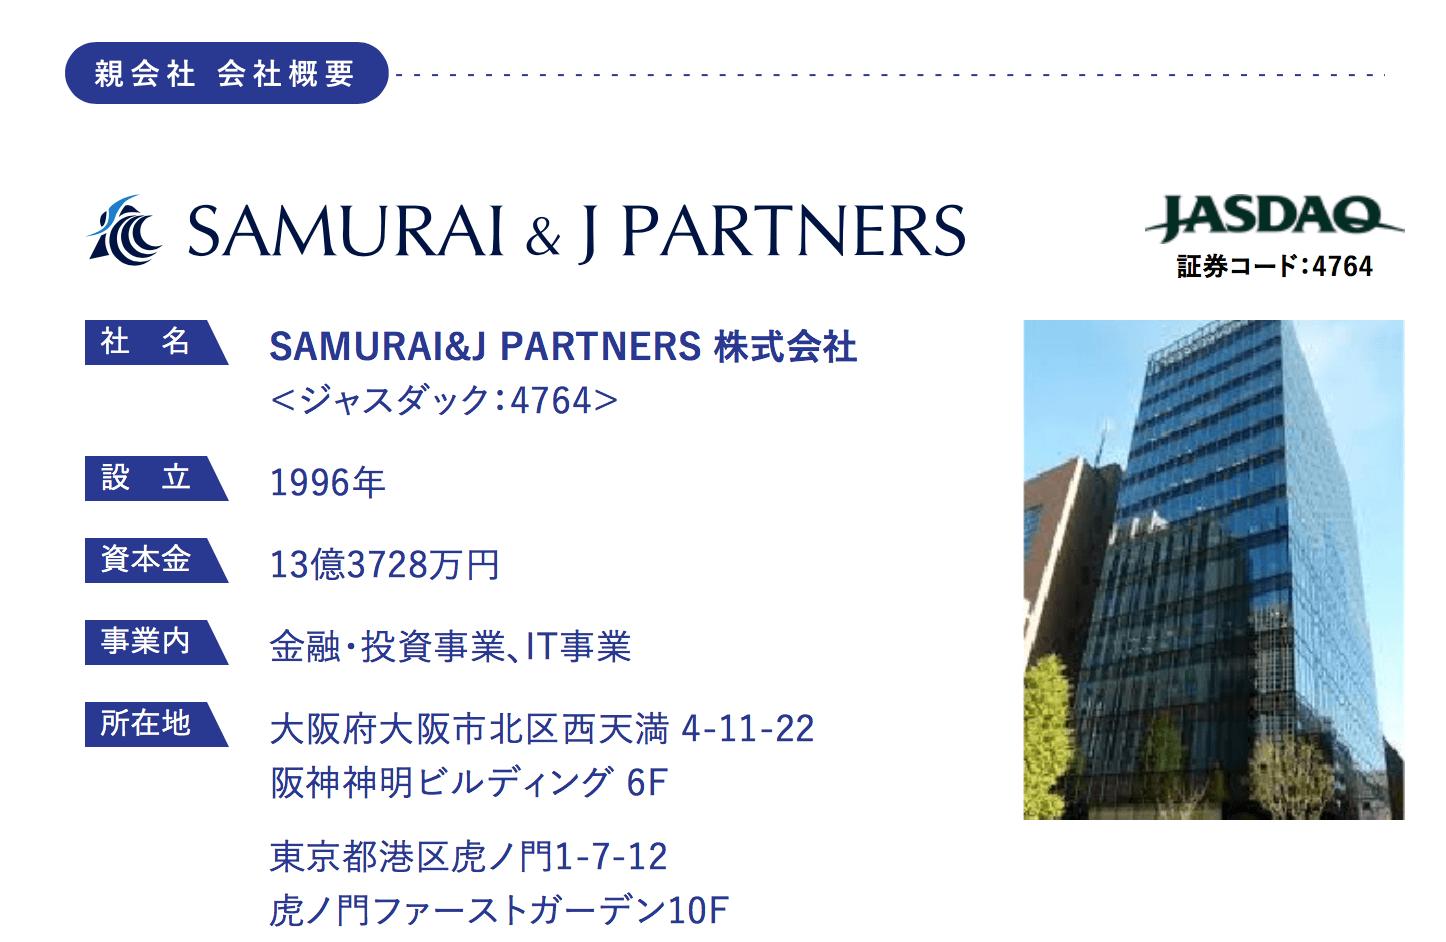 SAMURAI&J PARTNERS 株式会社